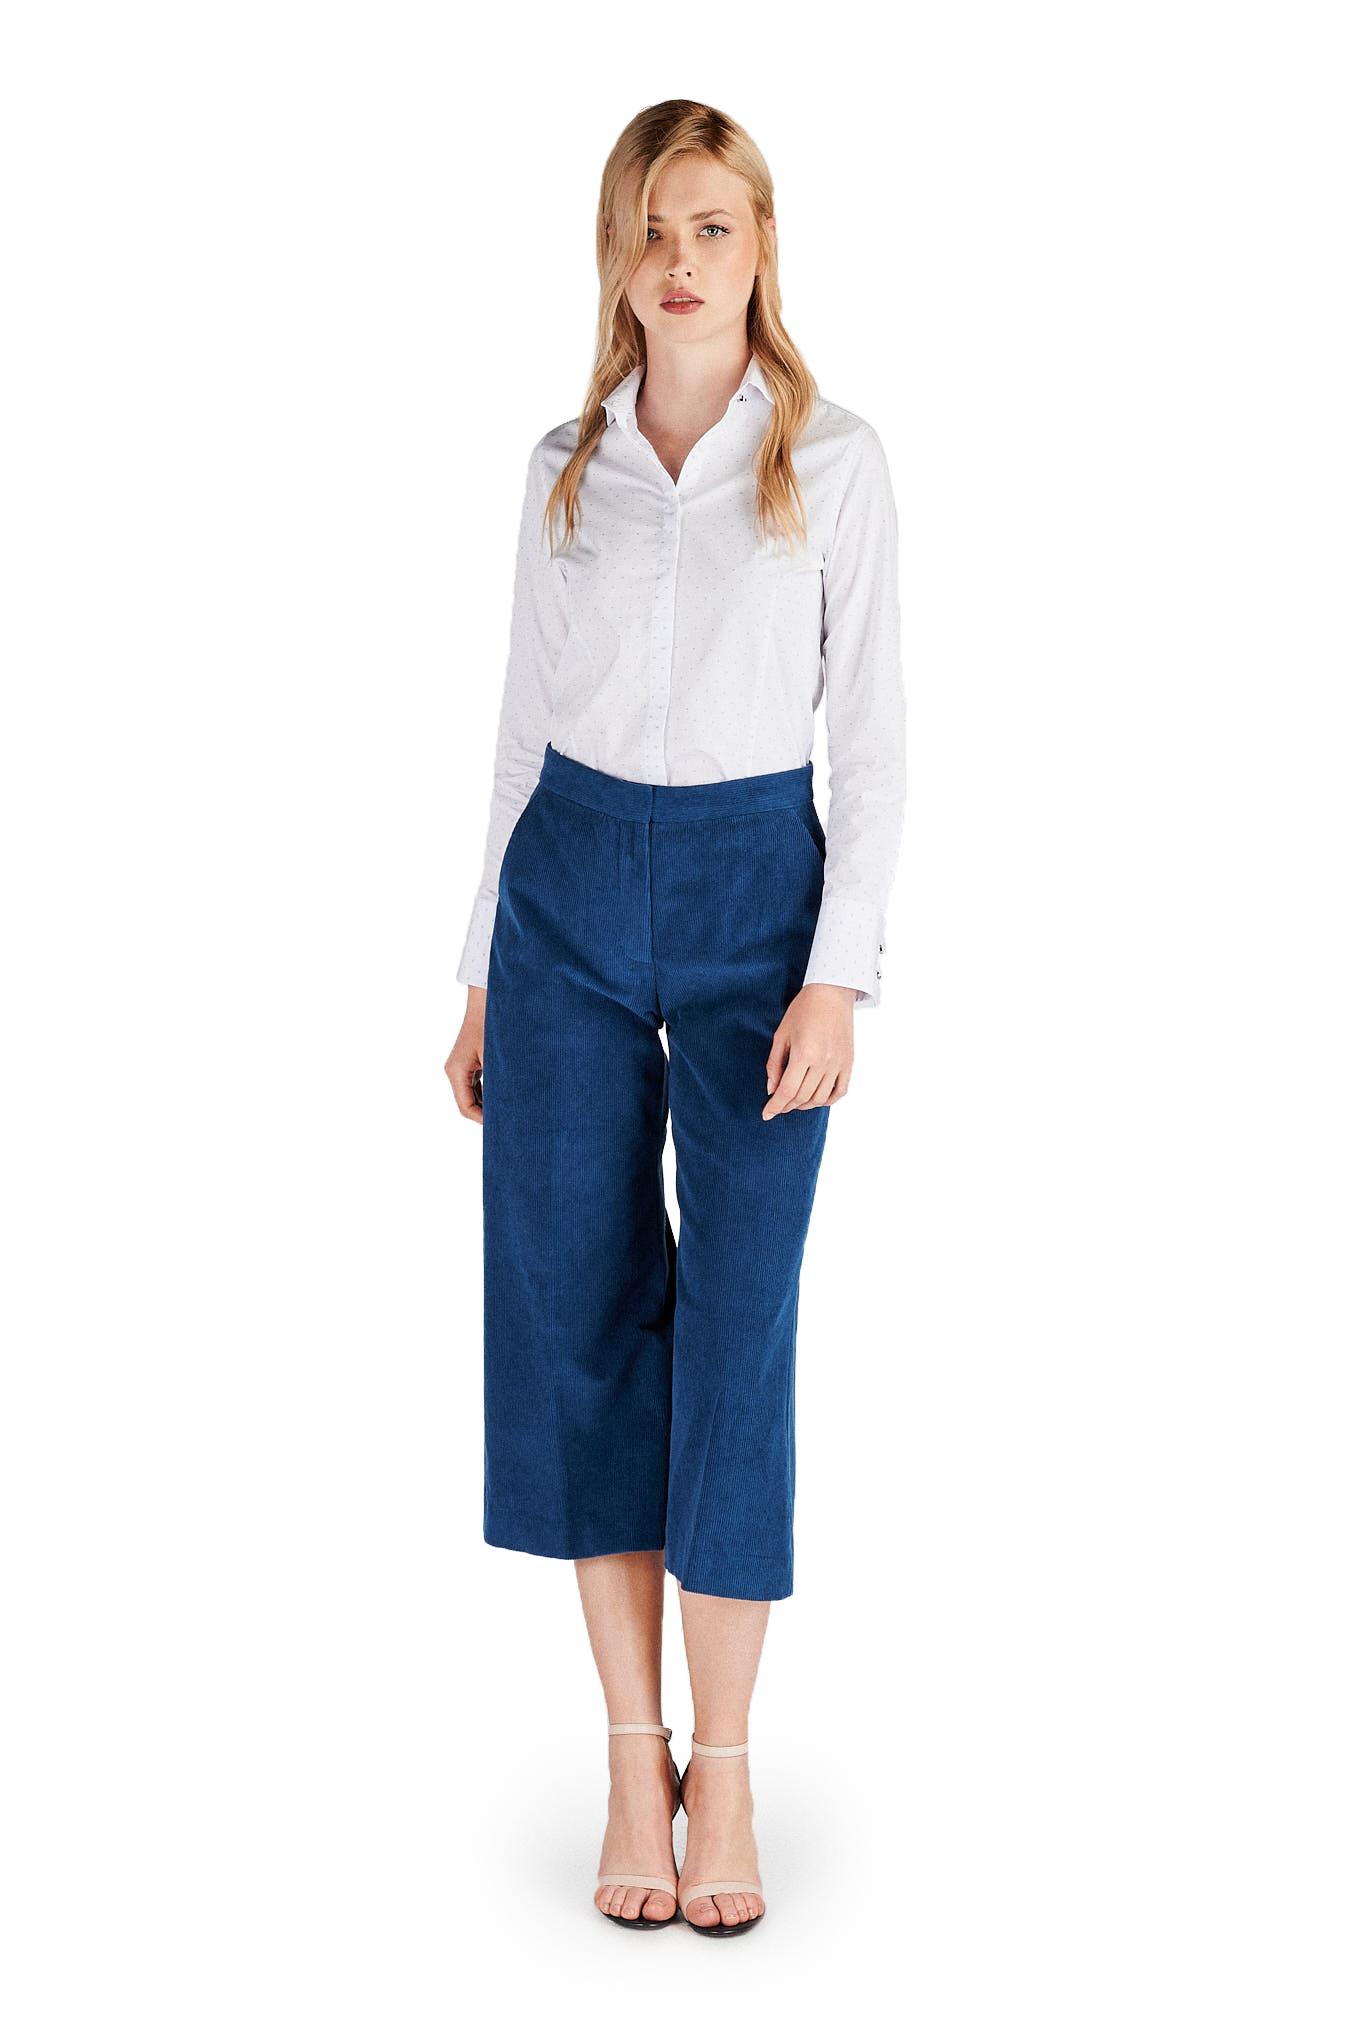 Shirt Light Blue Classic Woman